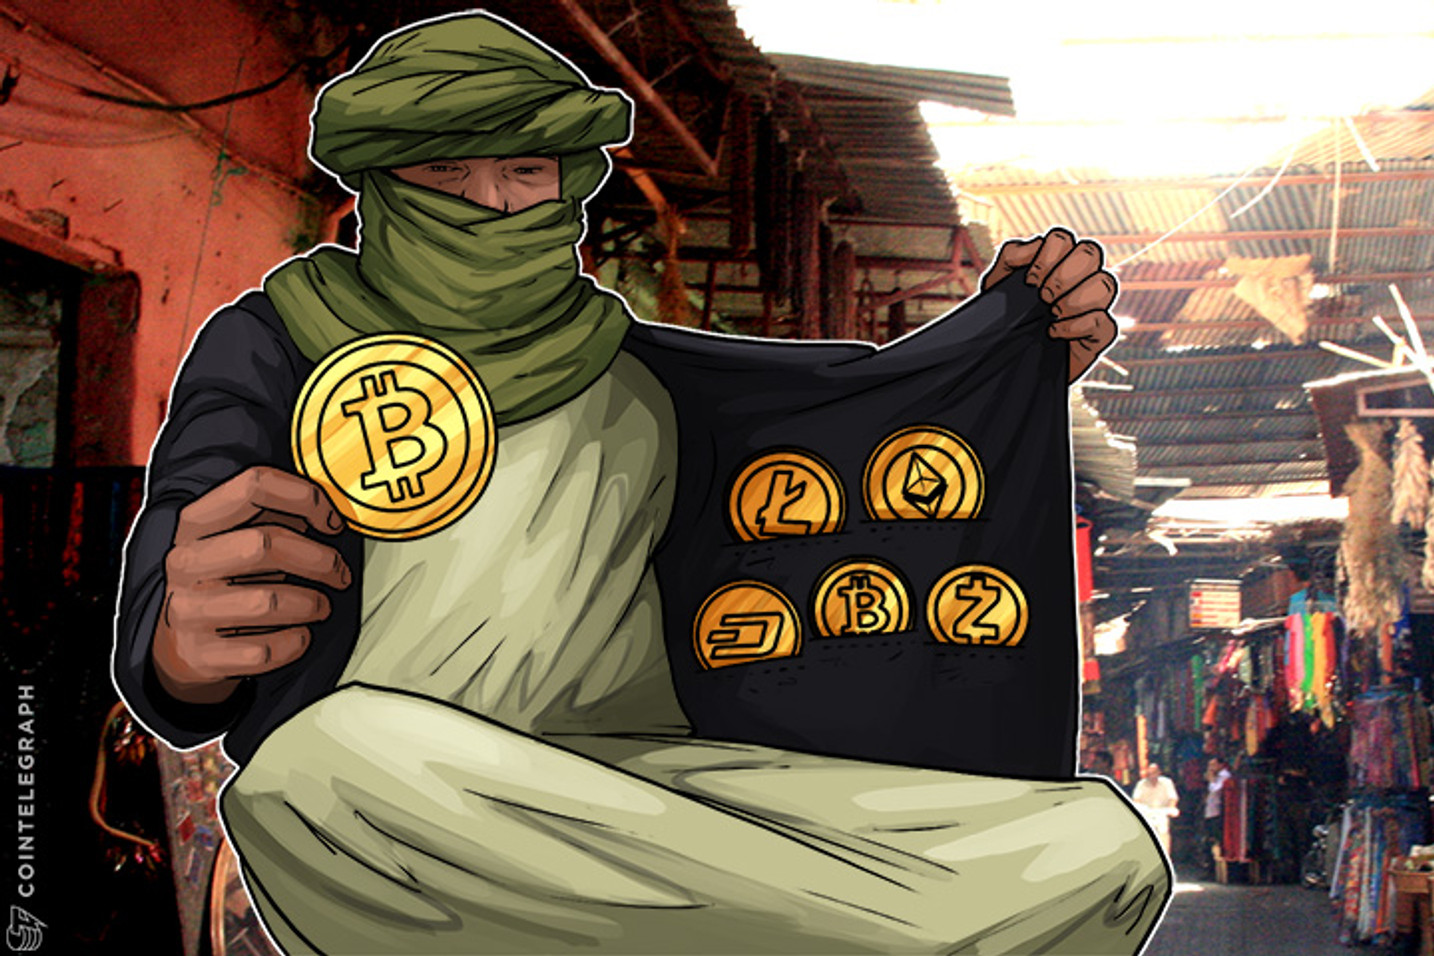 Bitcoin Conquers Morocco As Underground Crypto Bazaar is Flourishing